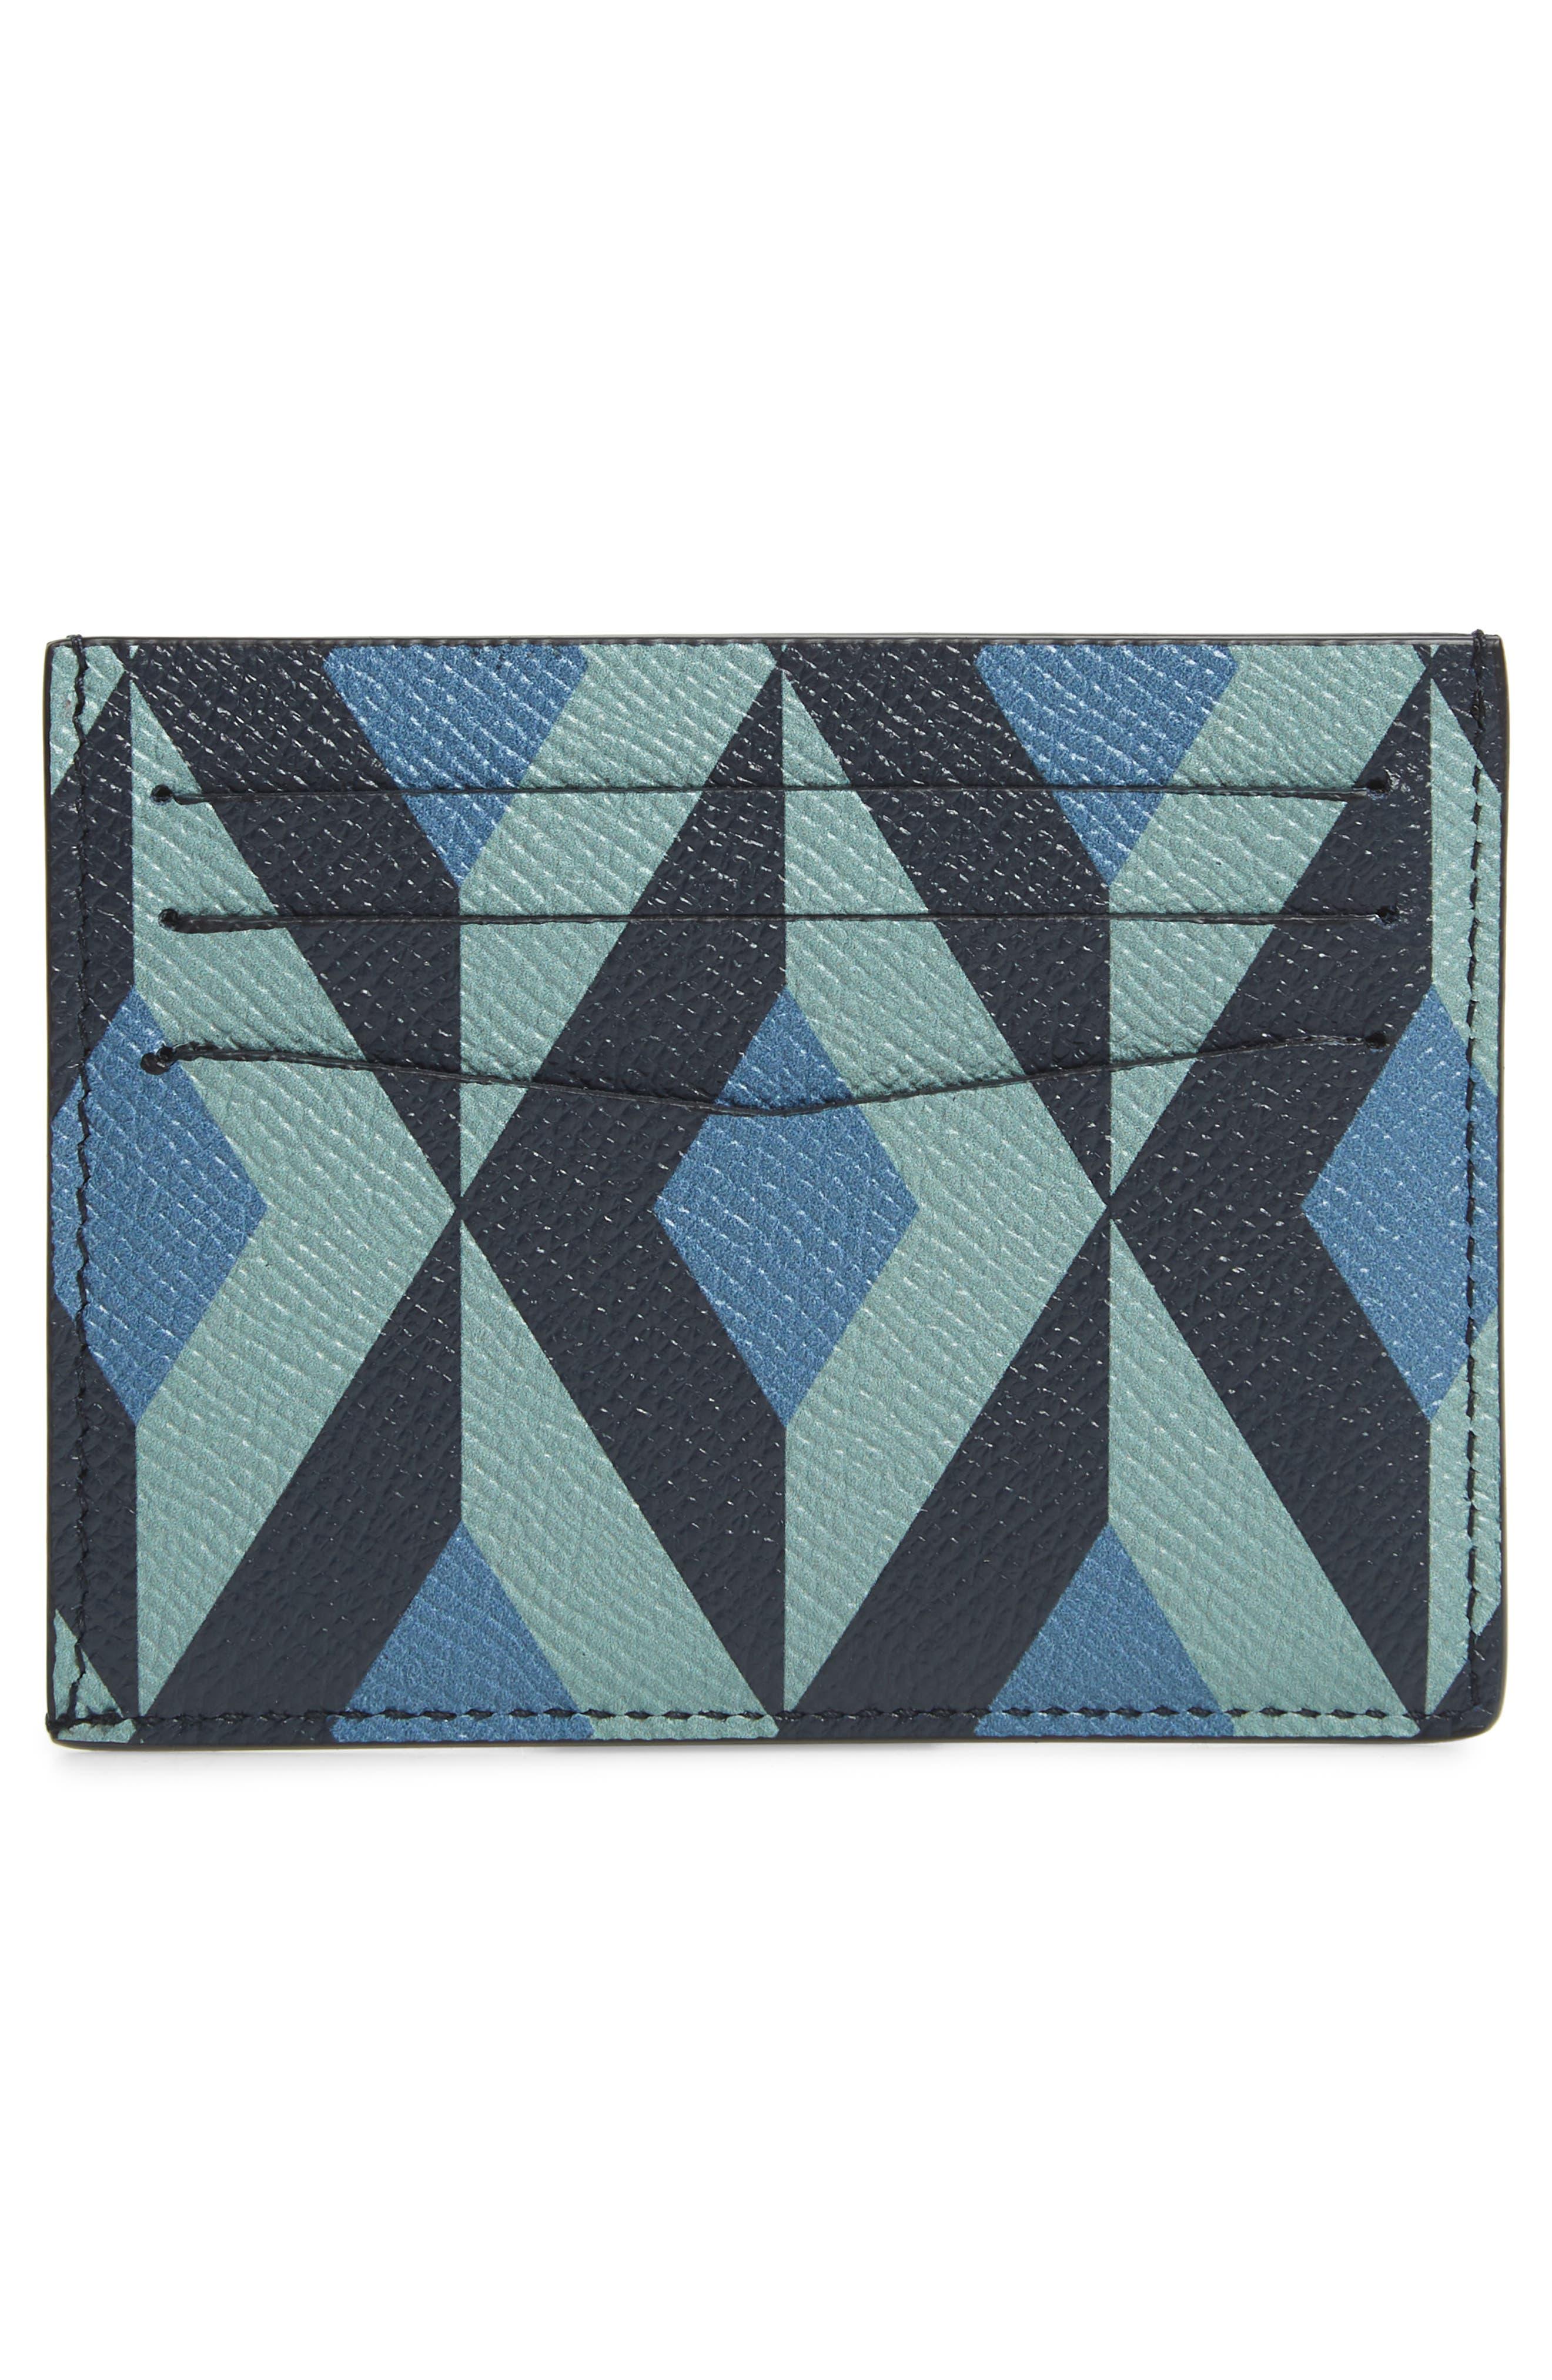 DUNHILL, Cadogan Leather Card Case, Alternate thumbnail 2, color, STONE BLUE